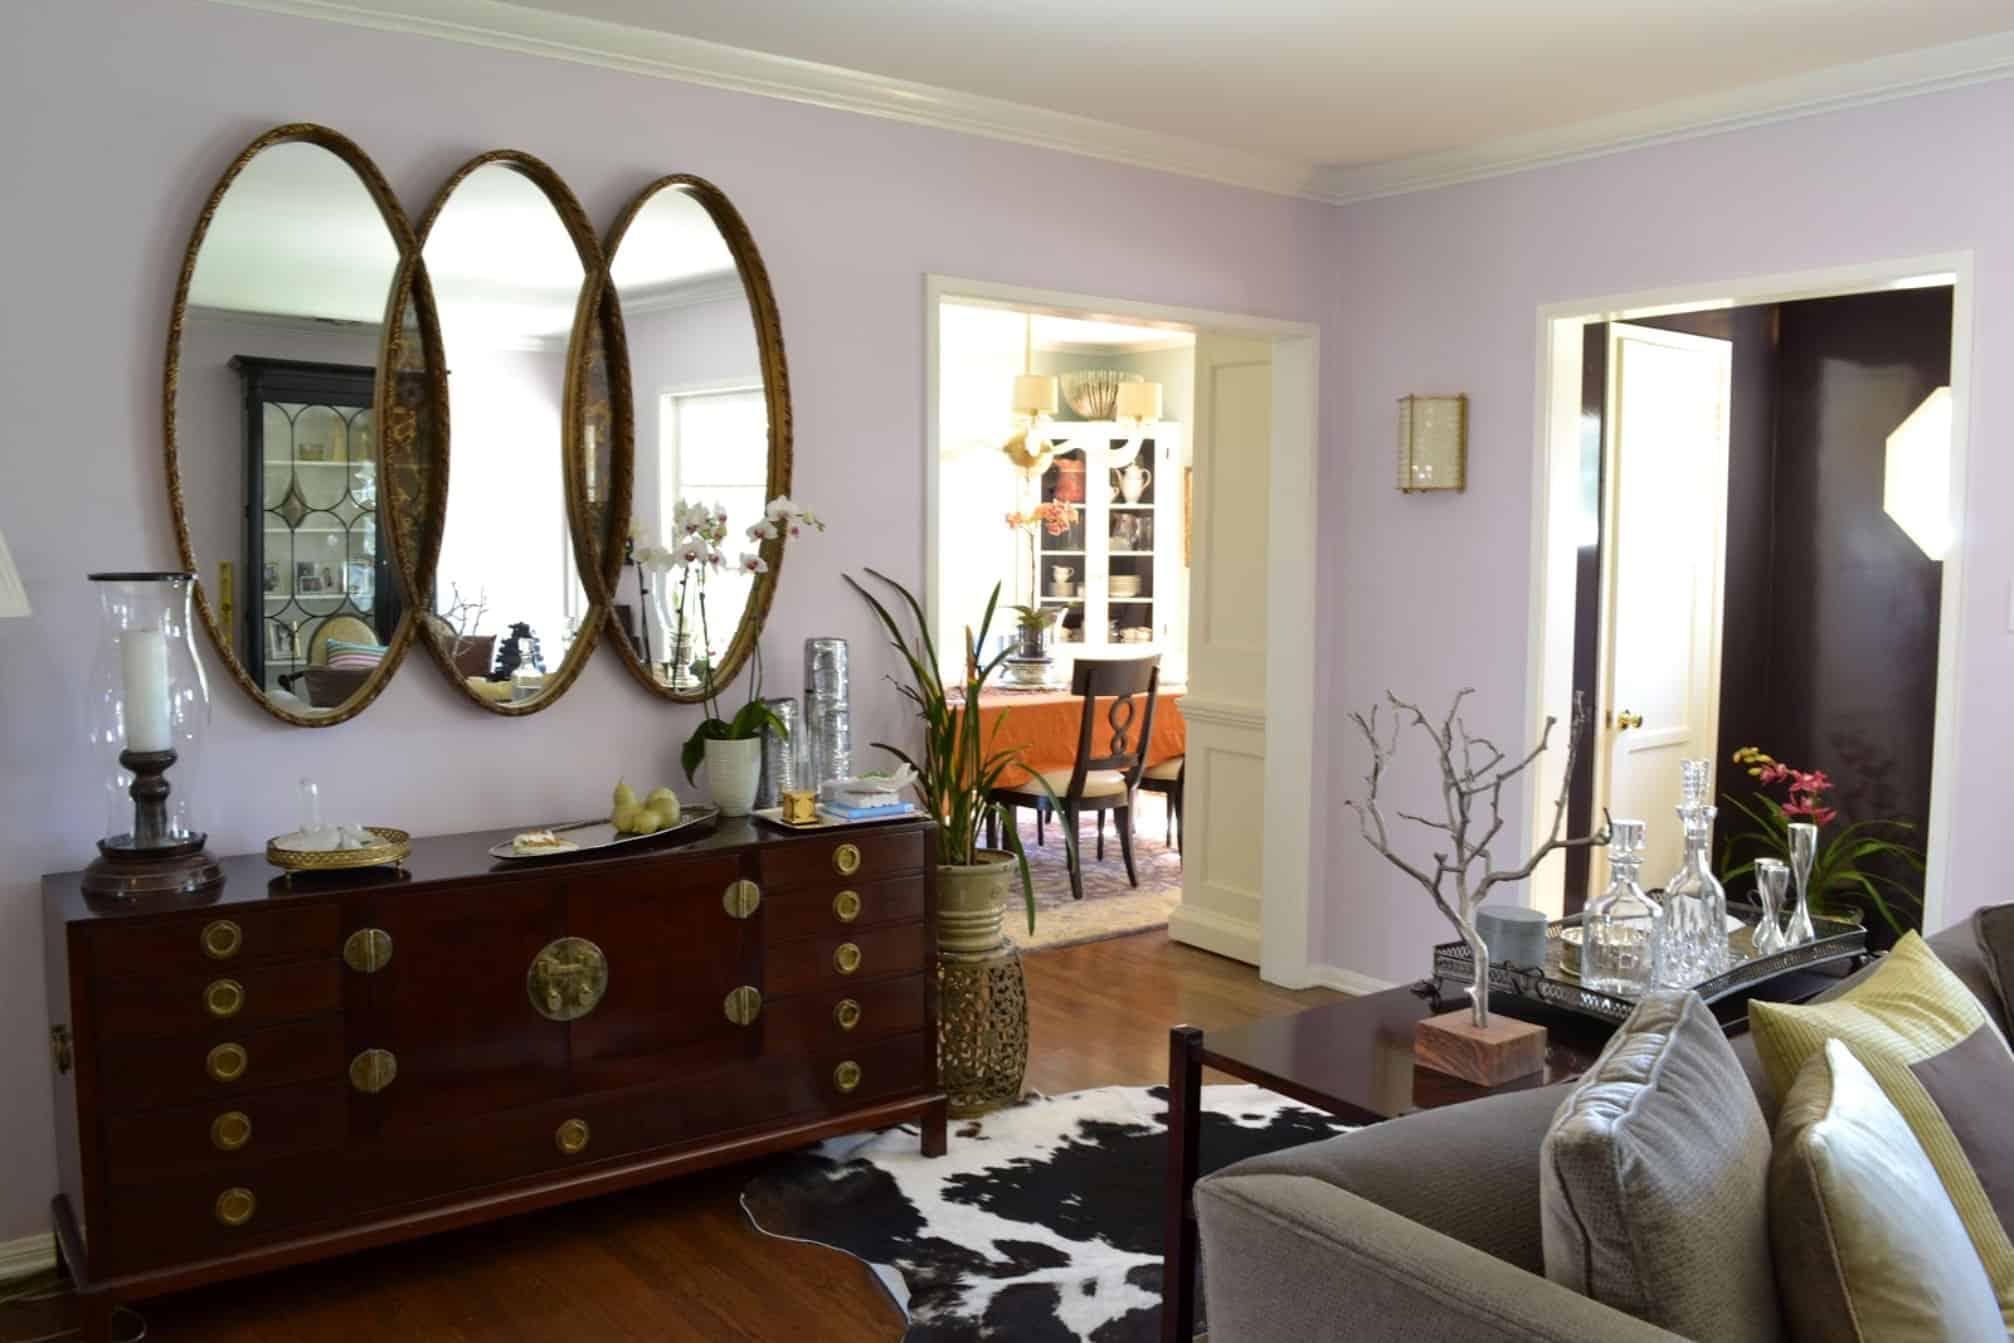 Mirror Image – living room idea